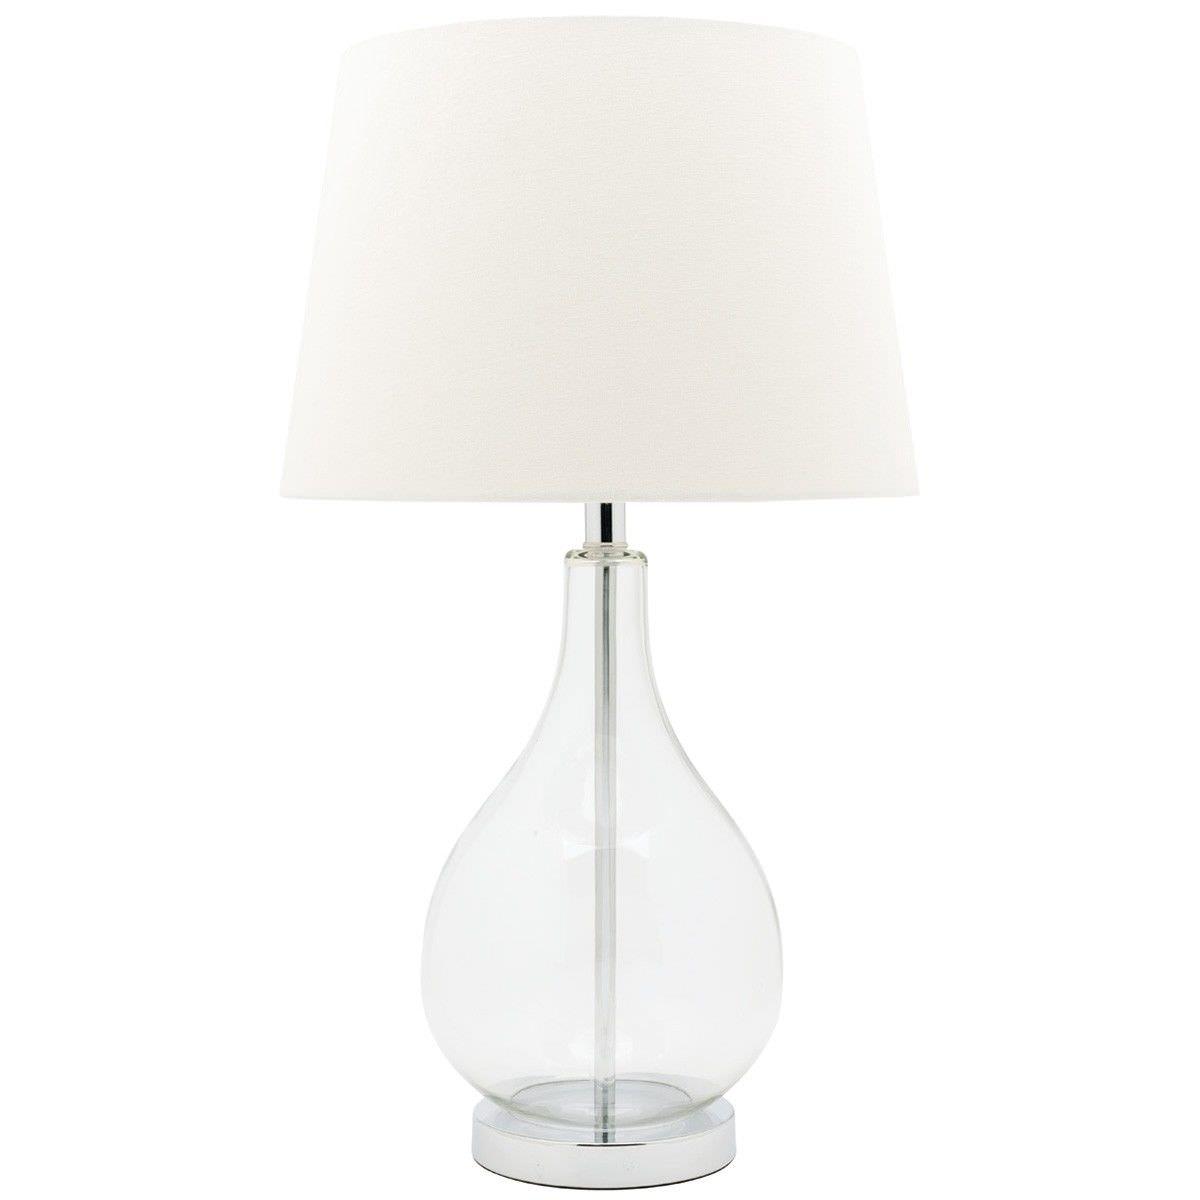 Gina Glass Base Table Lamp - White